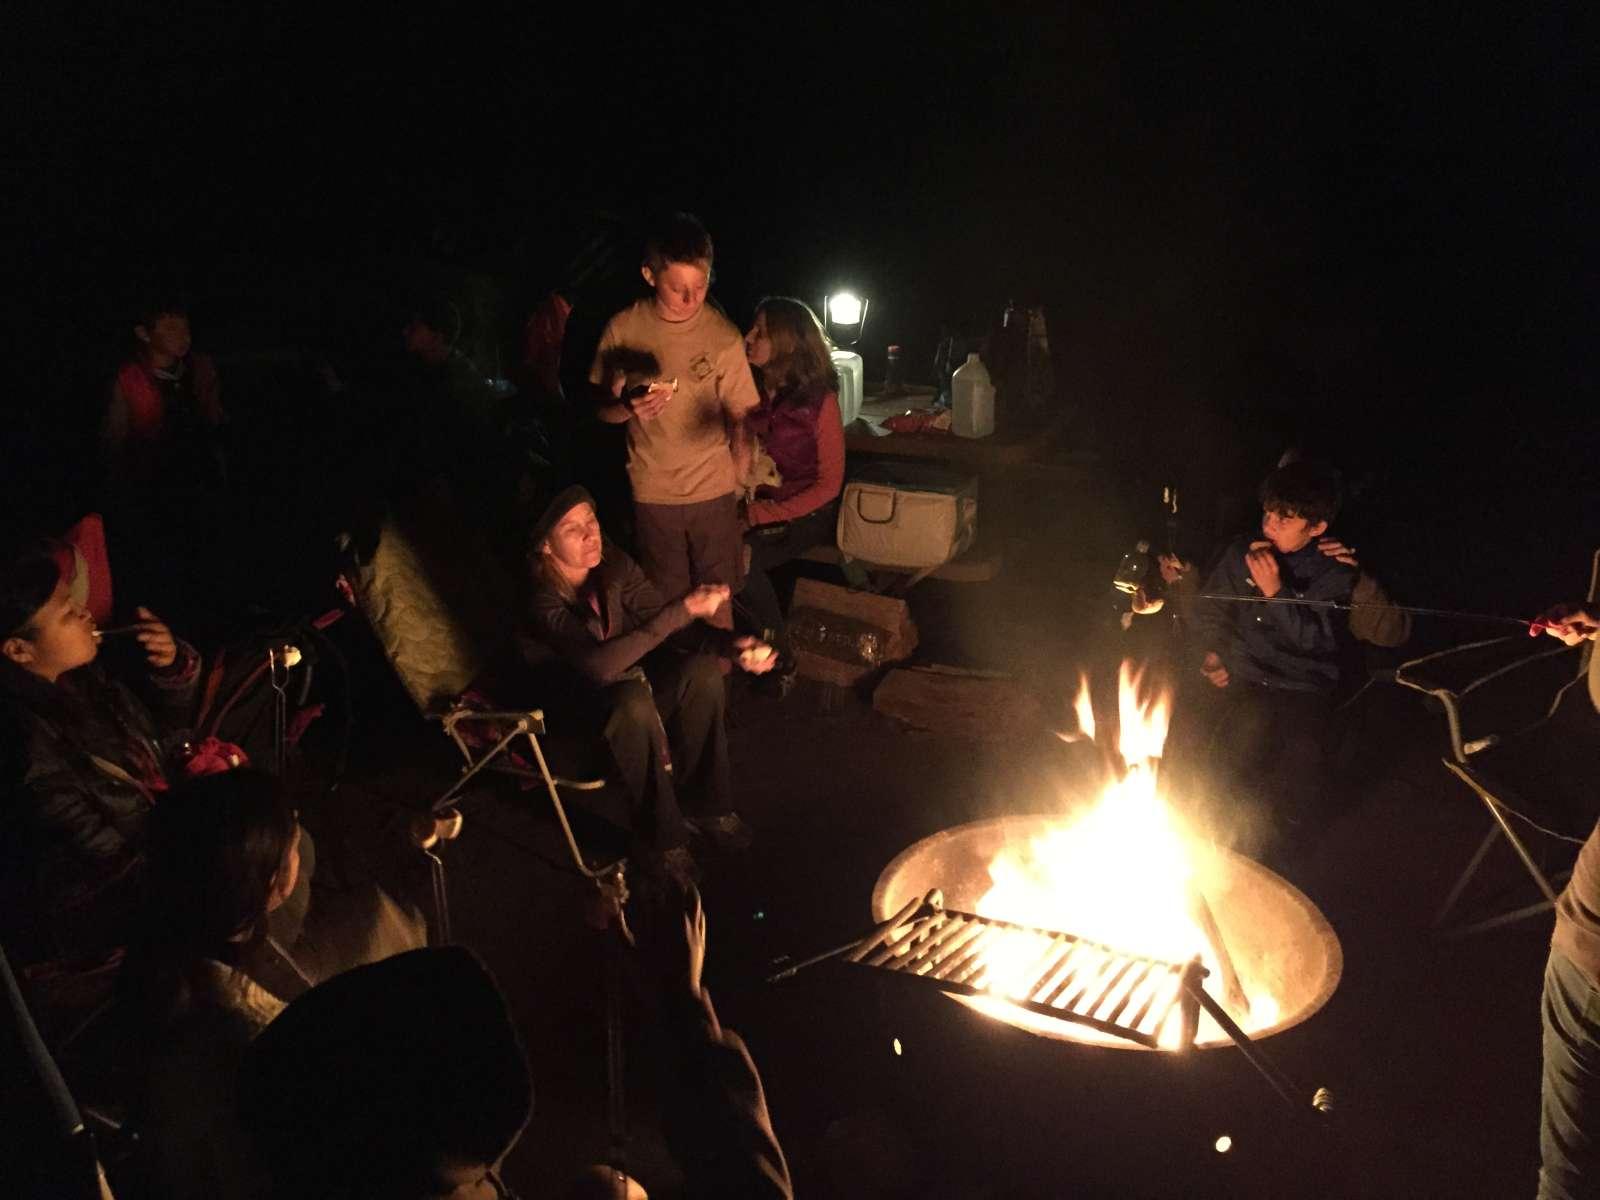 Chula Vista Campground, Los Padres, CA: 5 Hipcamper Reviews